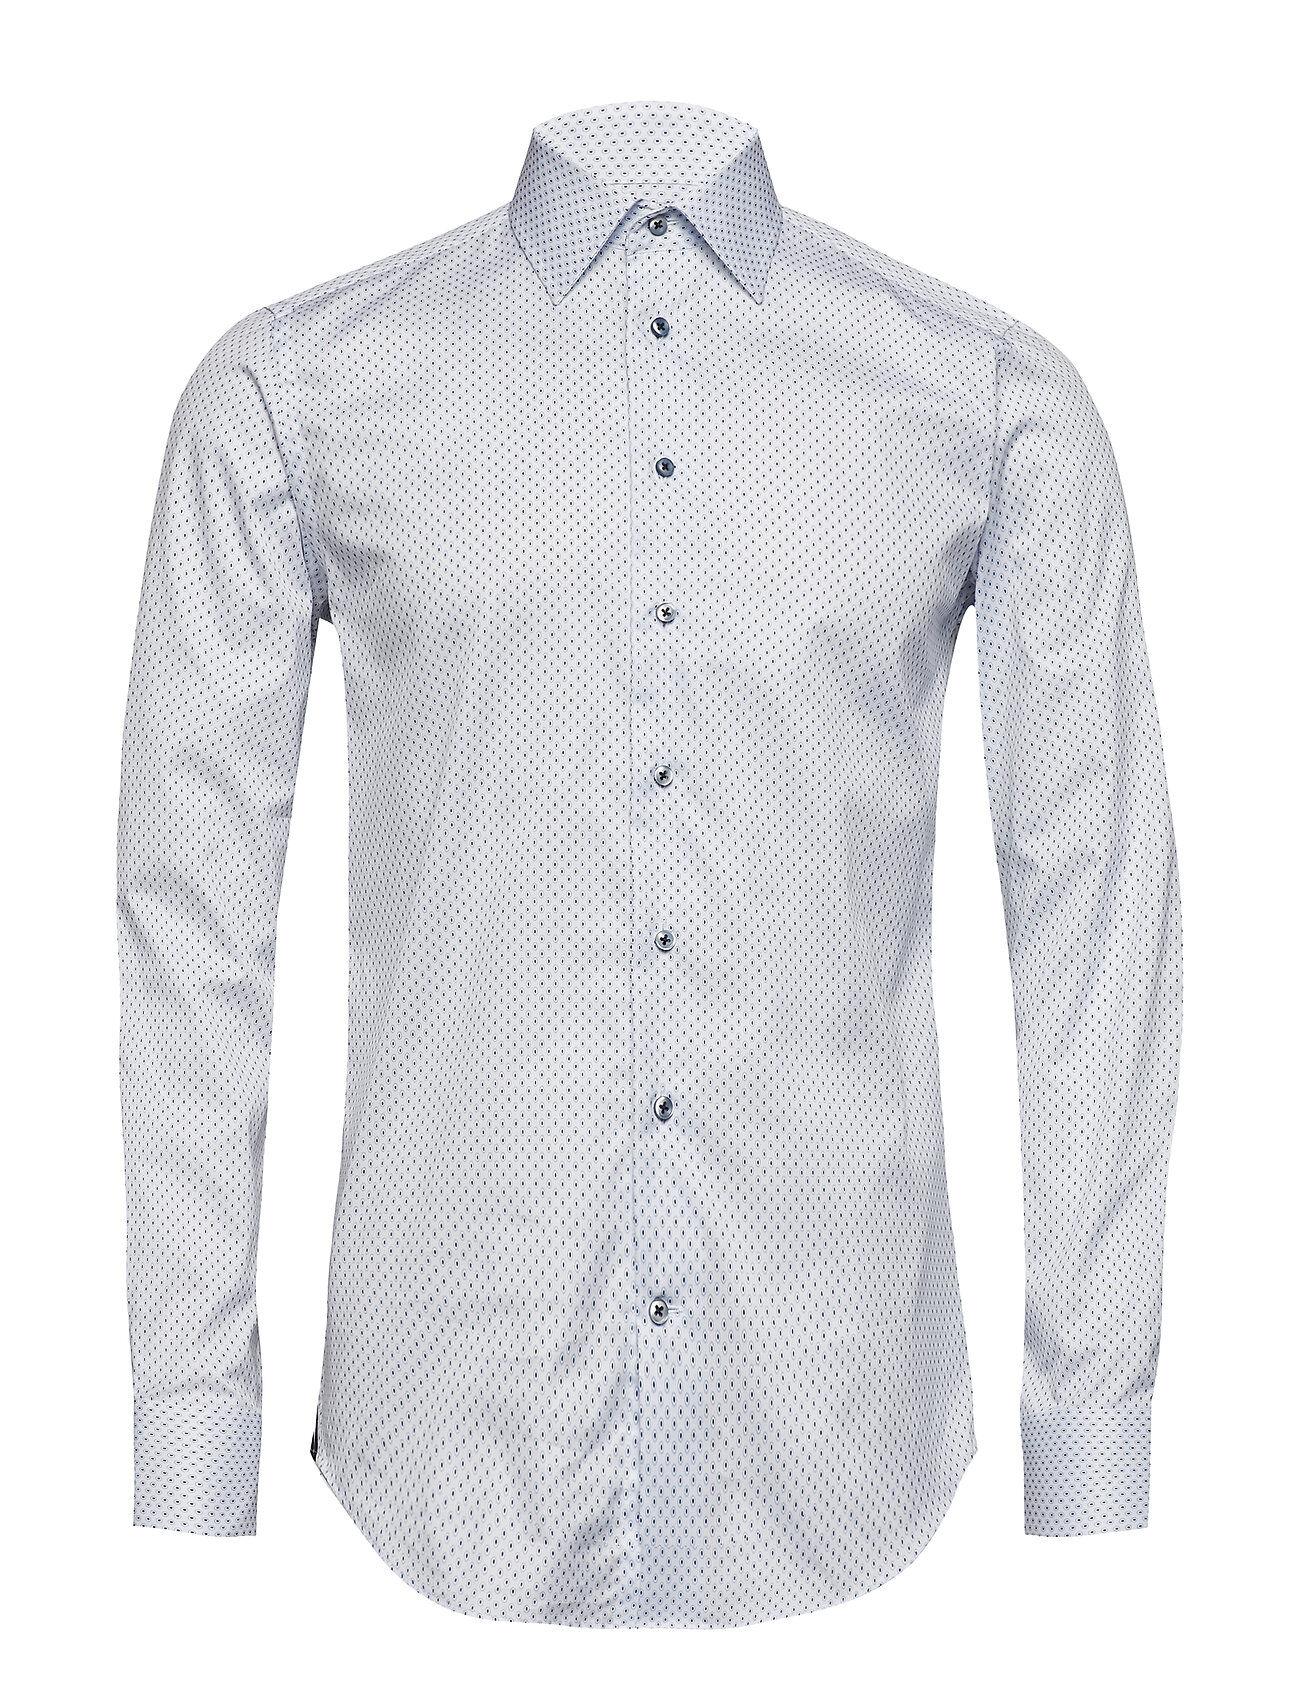 XO Shirtmaker by Sand Copenhagen 8999 - Jake Sc